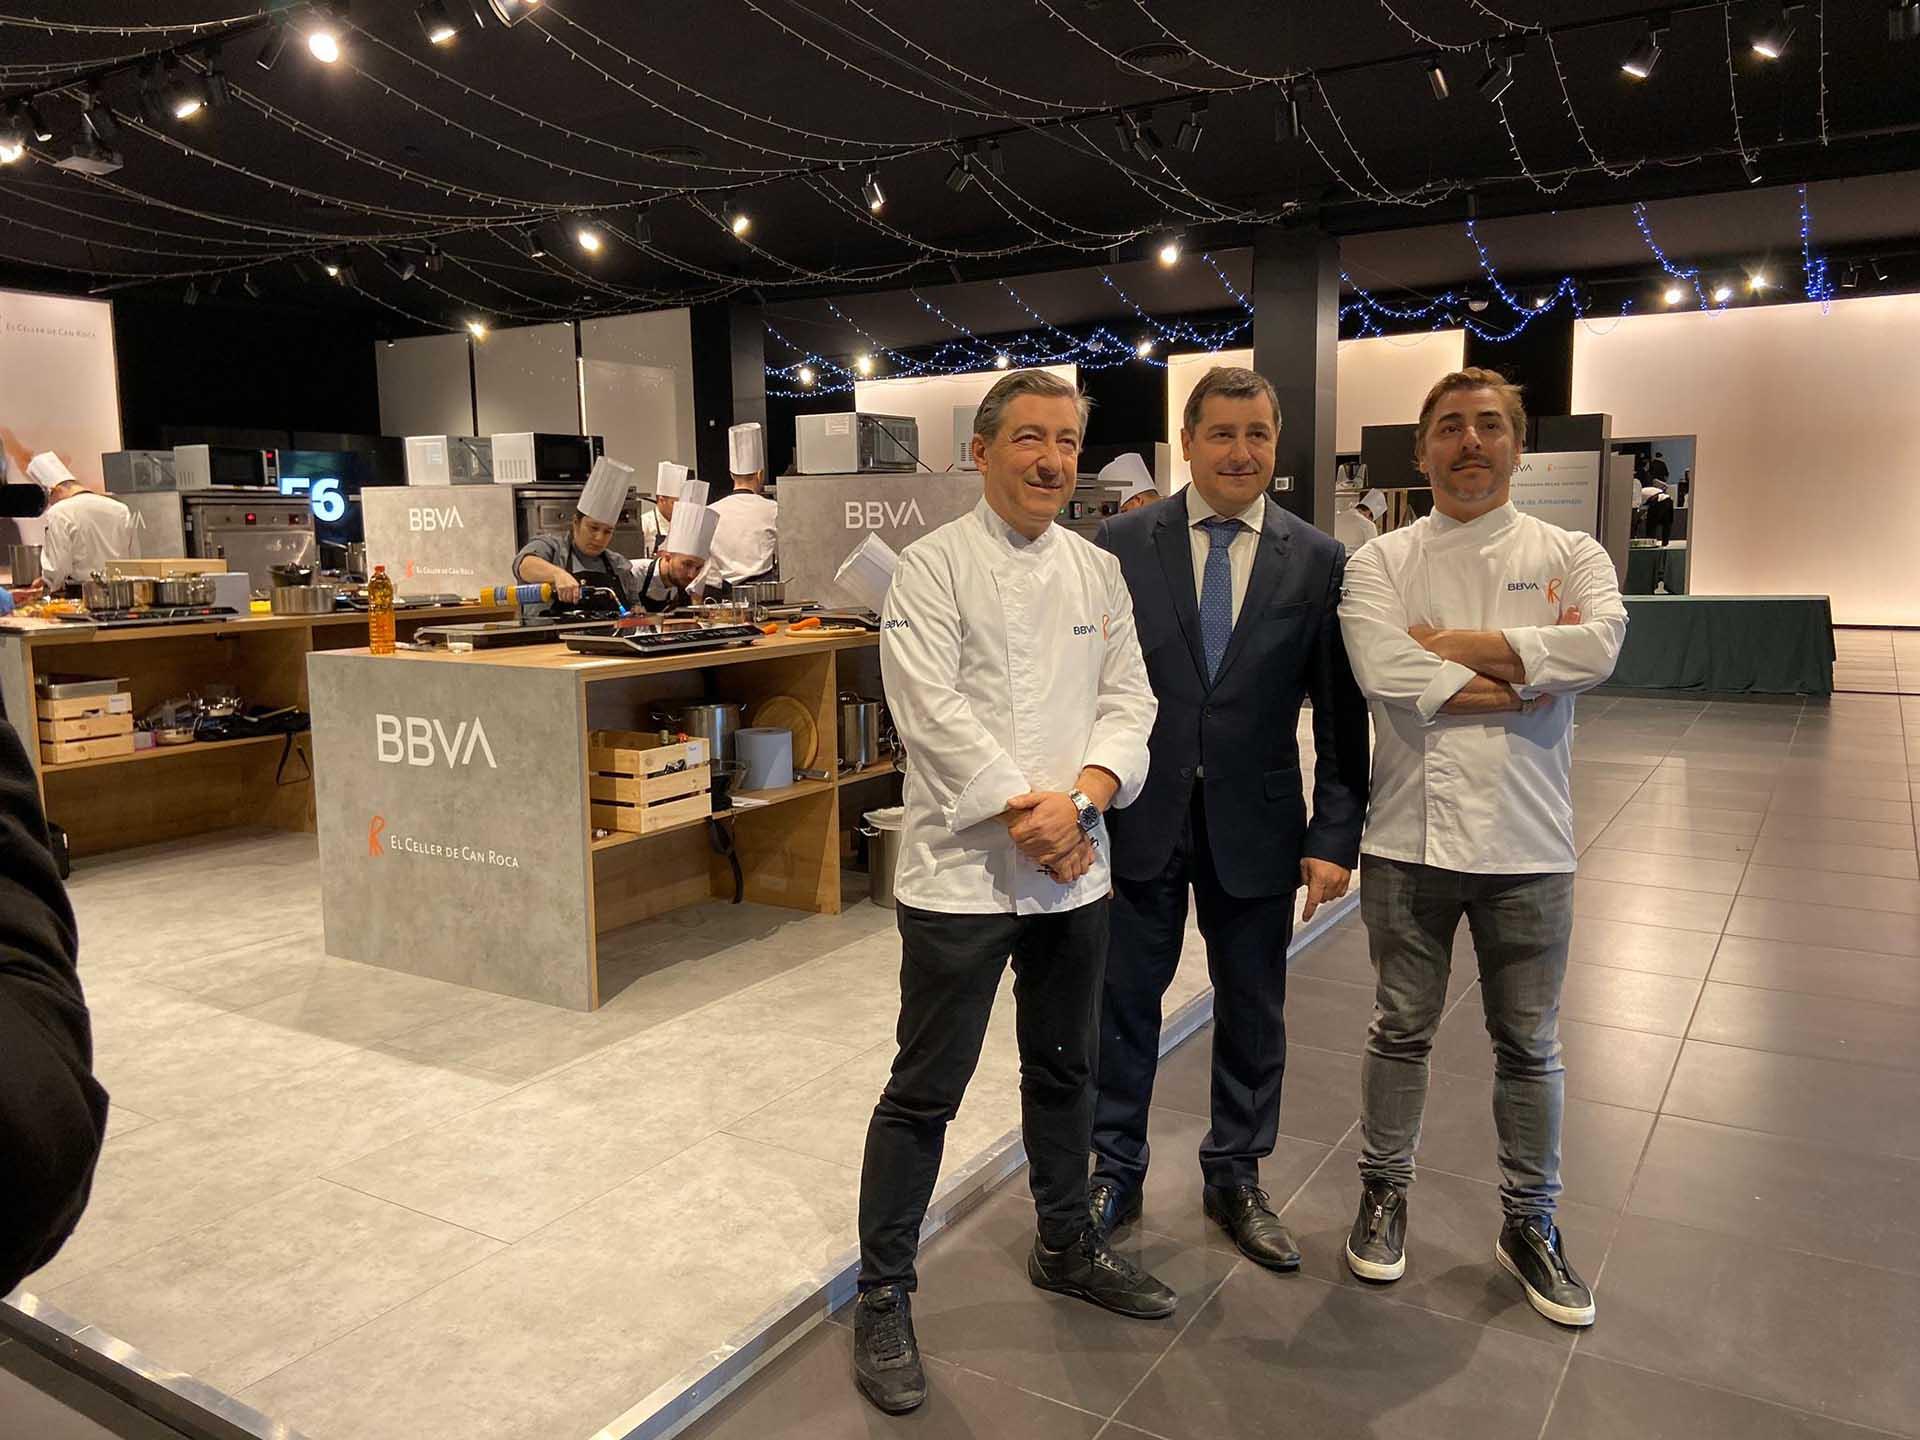 Event awards BBVA hospitality scholarships kitchen design